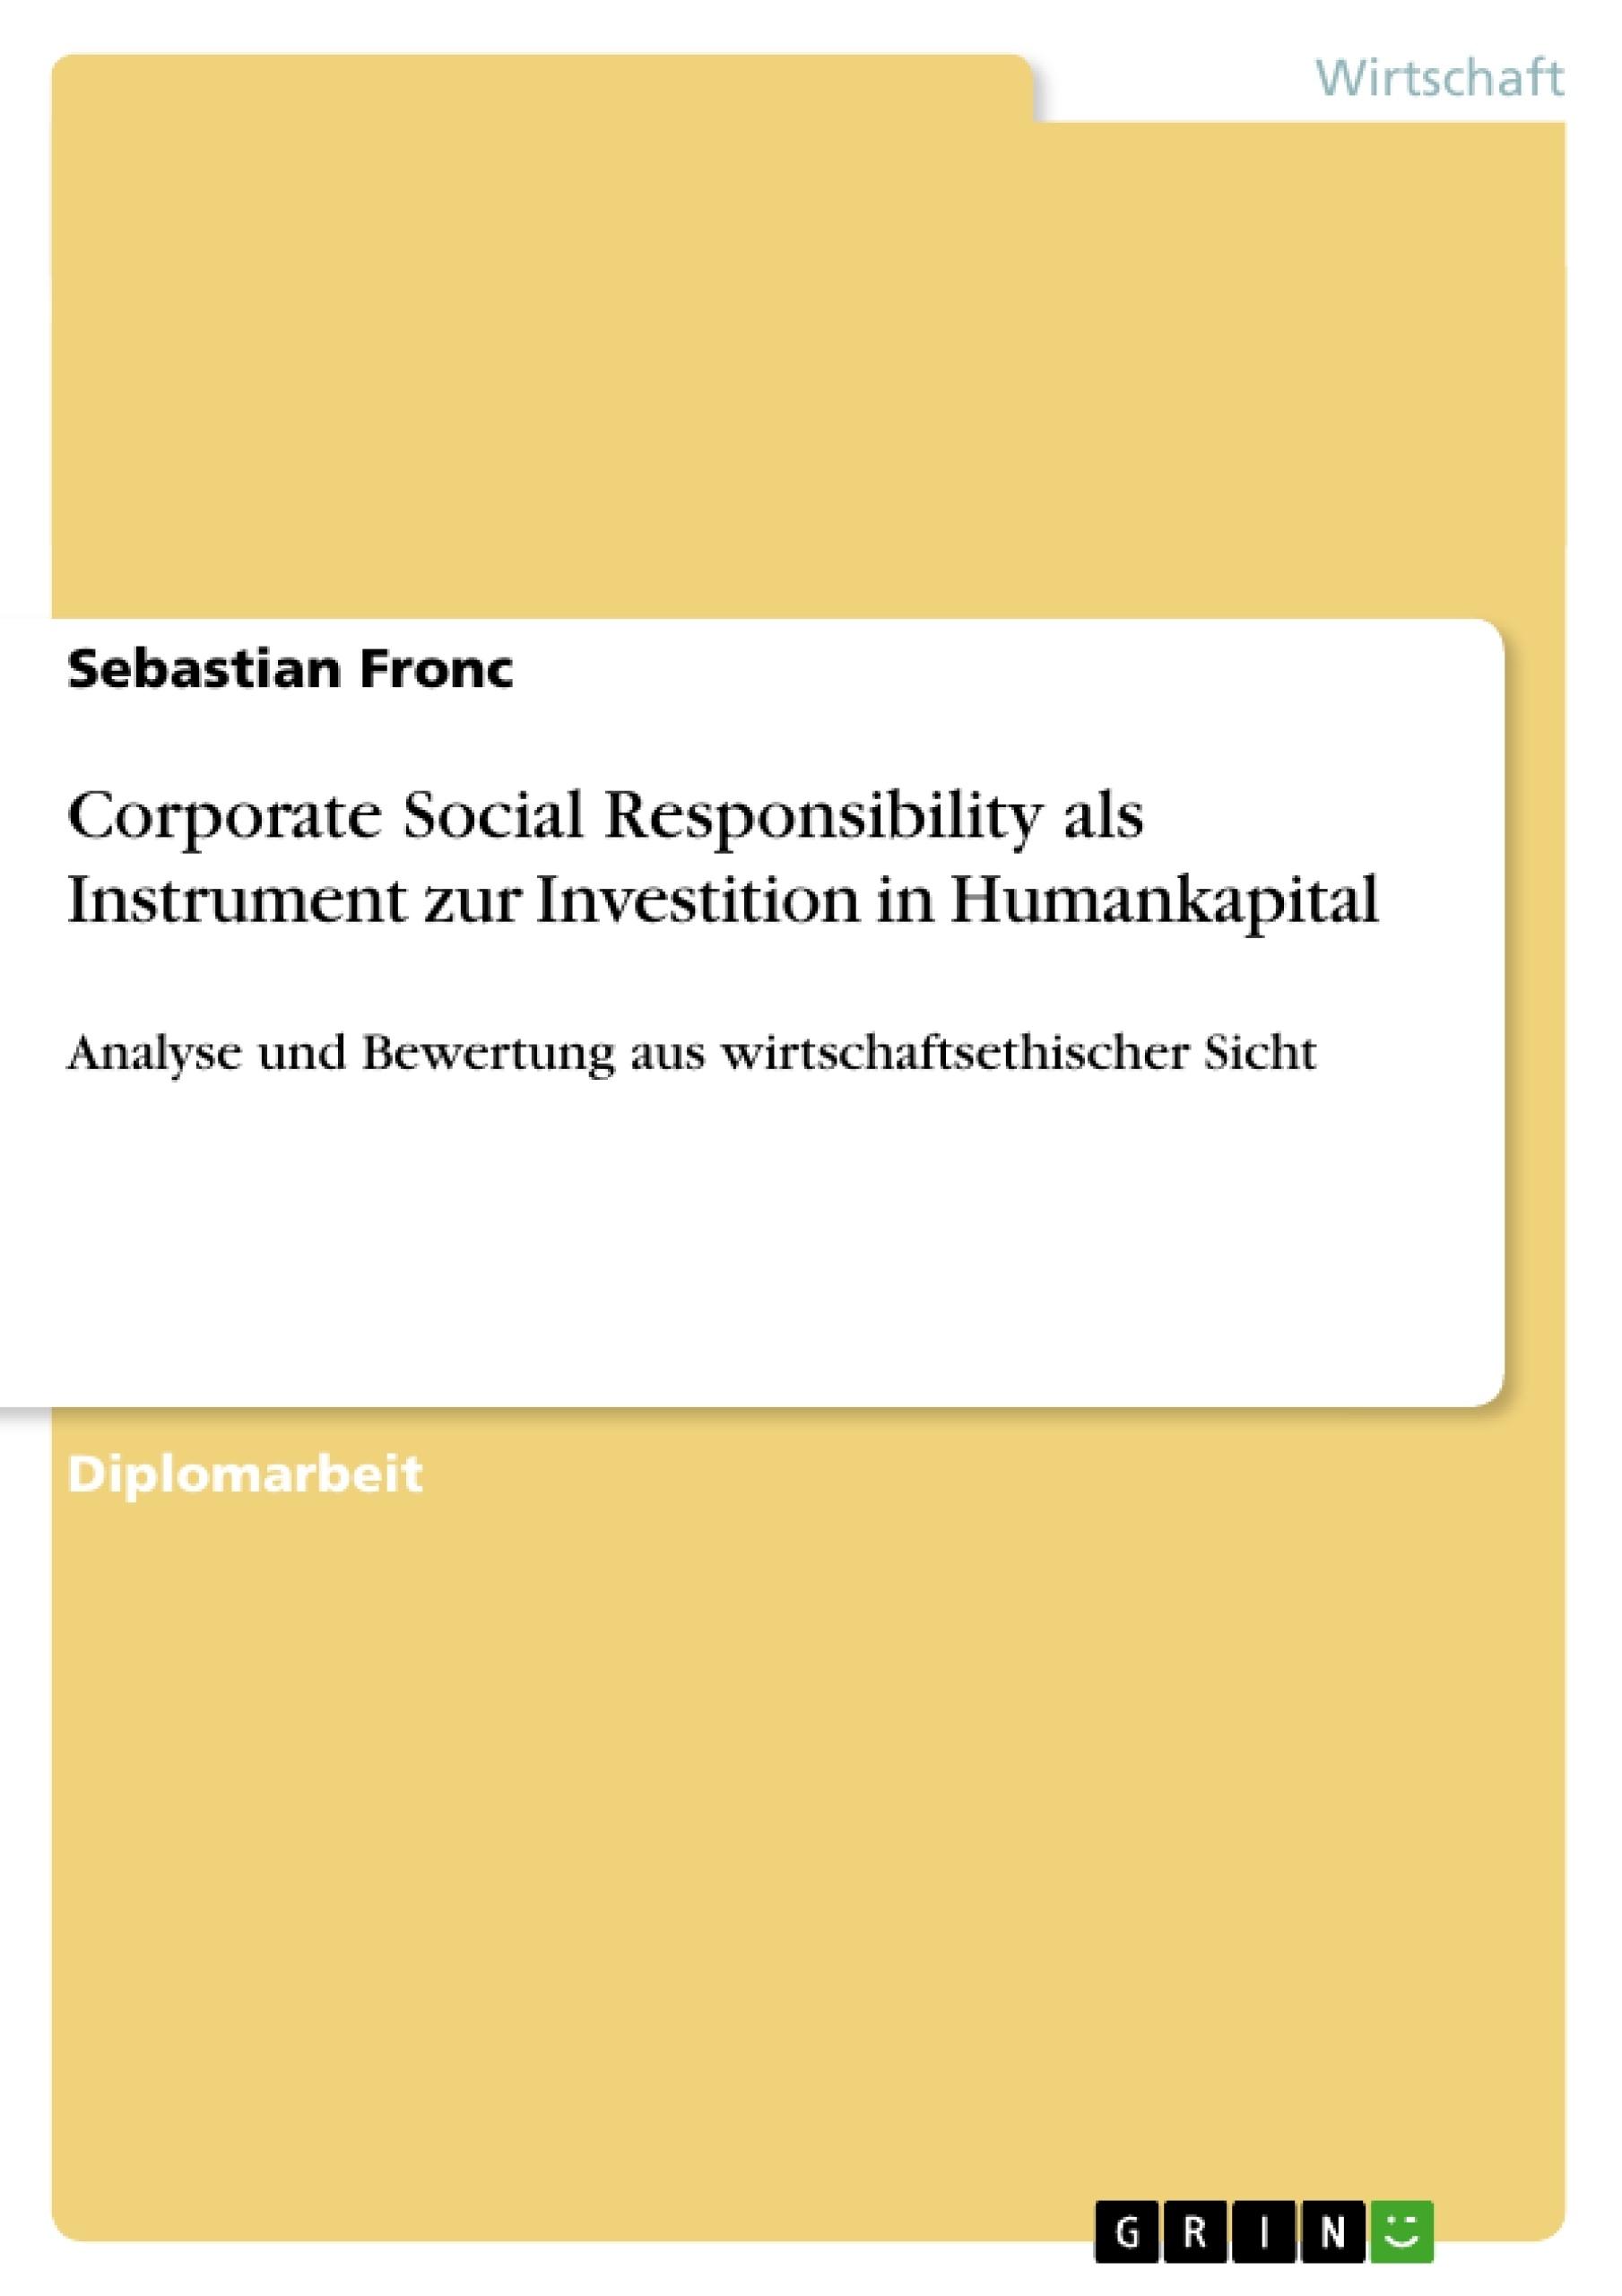 Titel: Corporate Social Responsibility als Instrument zur Investition in Humankapital